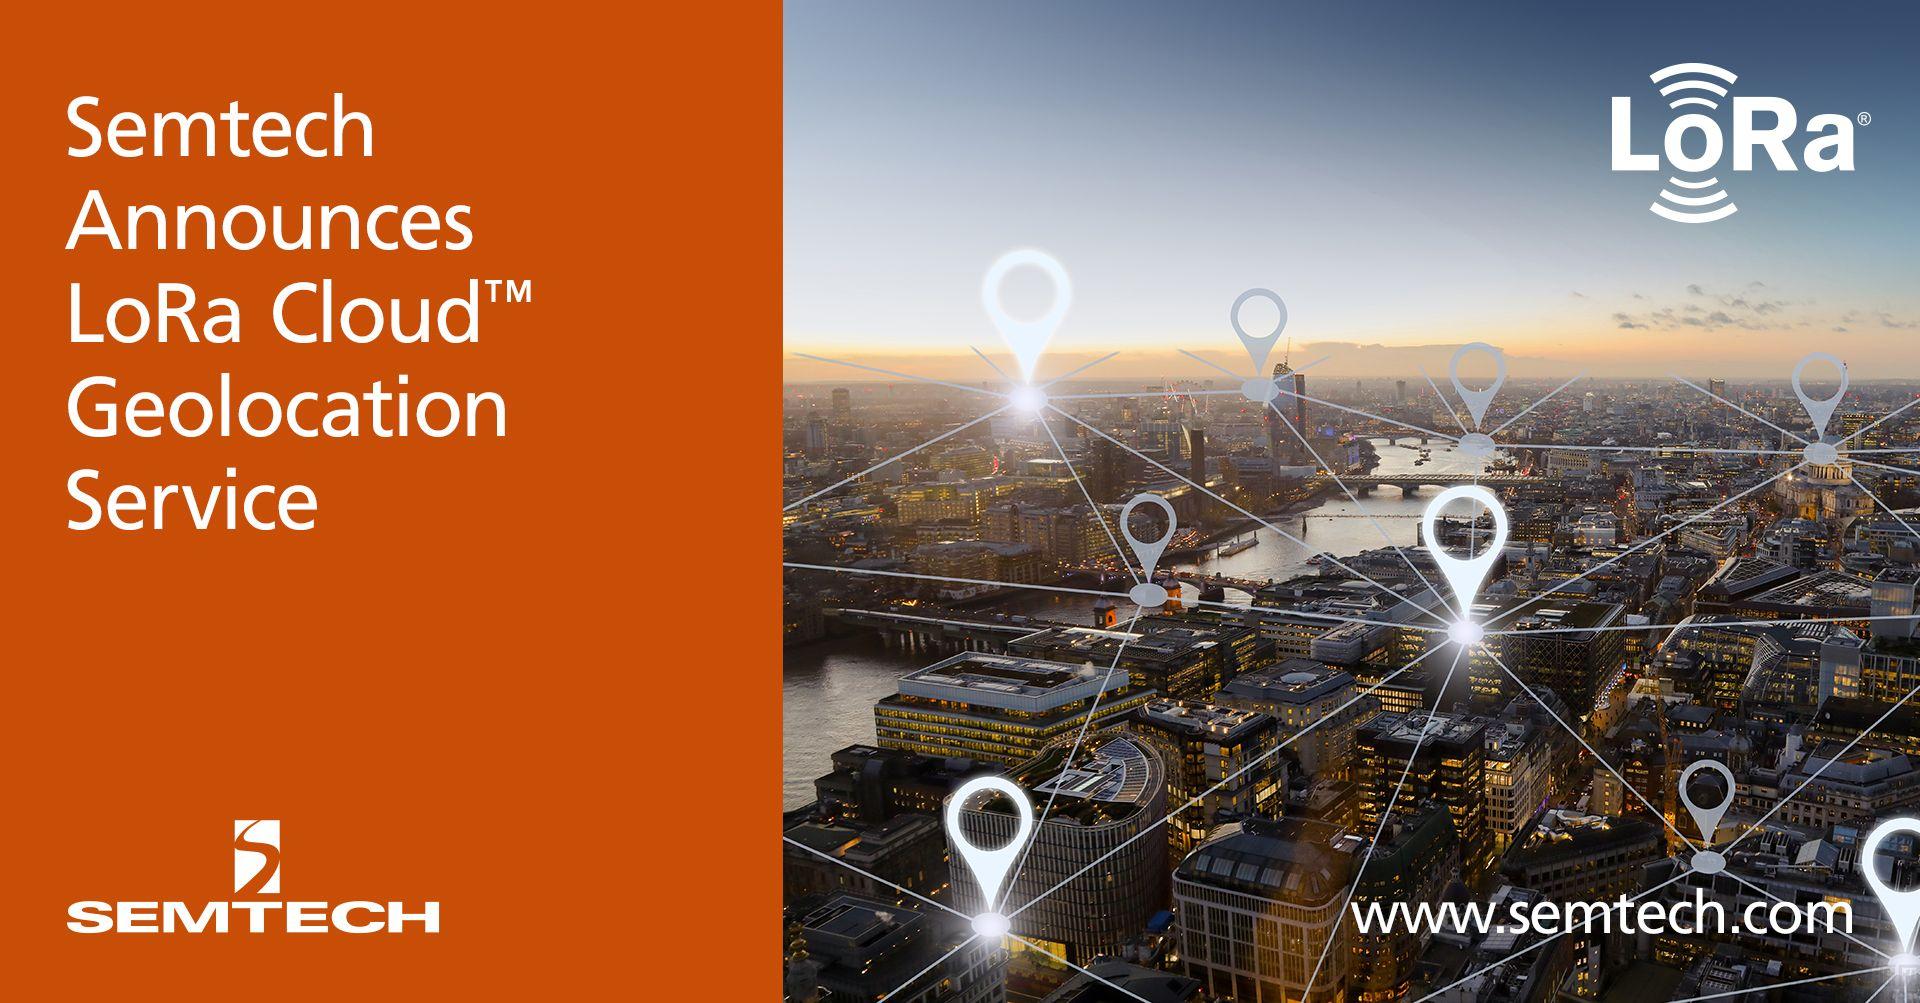 Semtech 宣布推出 LoRa Cloud™ 地理定位服务